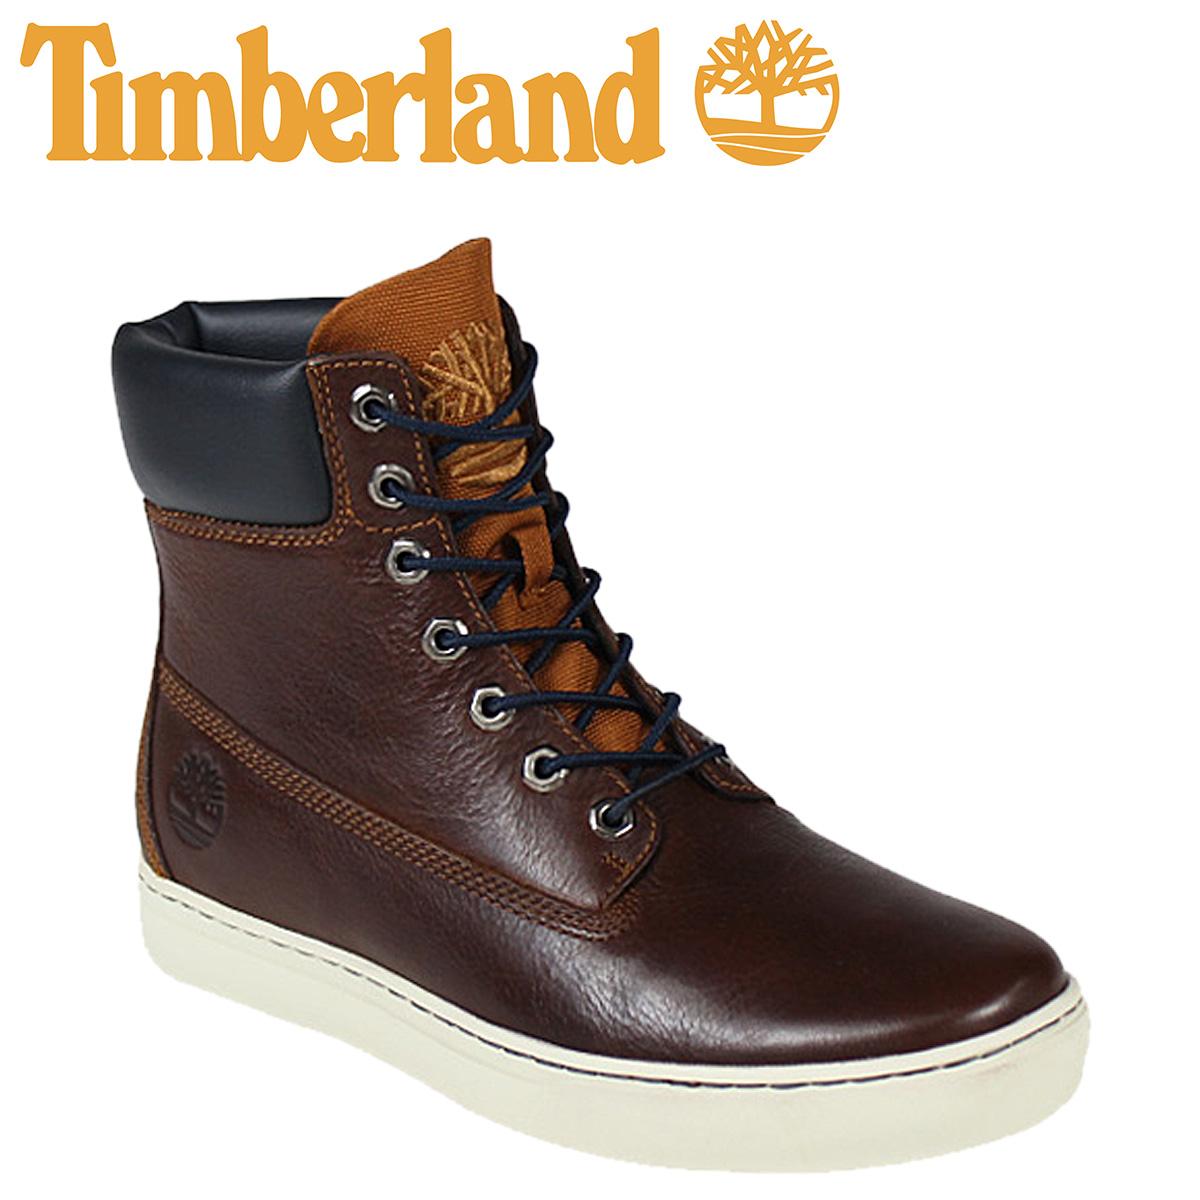 Timberland ティンバーランド 6INCH 6インチ ブーツ NEWMARKET 2.0 CUPSOLE 6 INCH BOOT 6811A Wワイズ メンズ